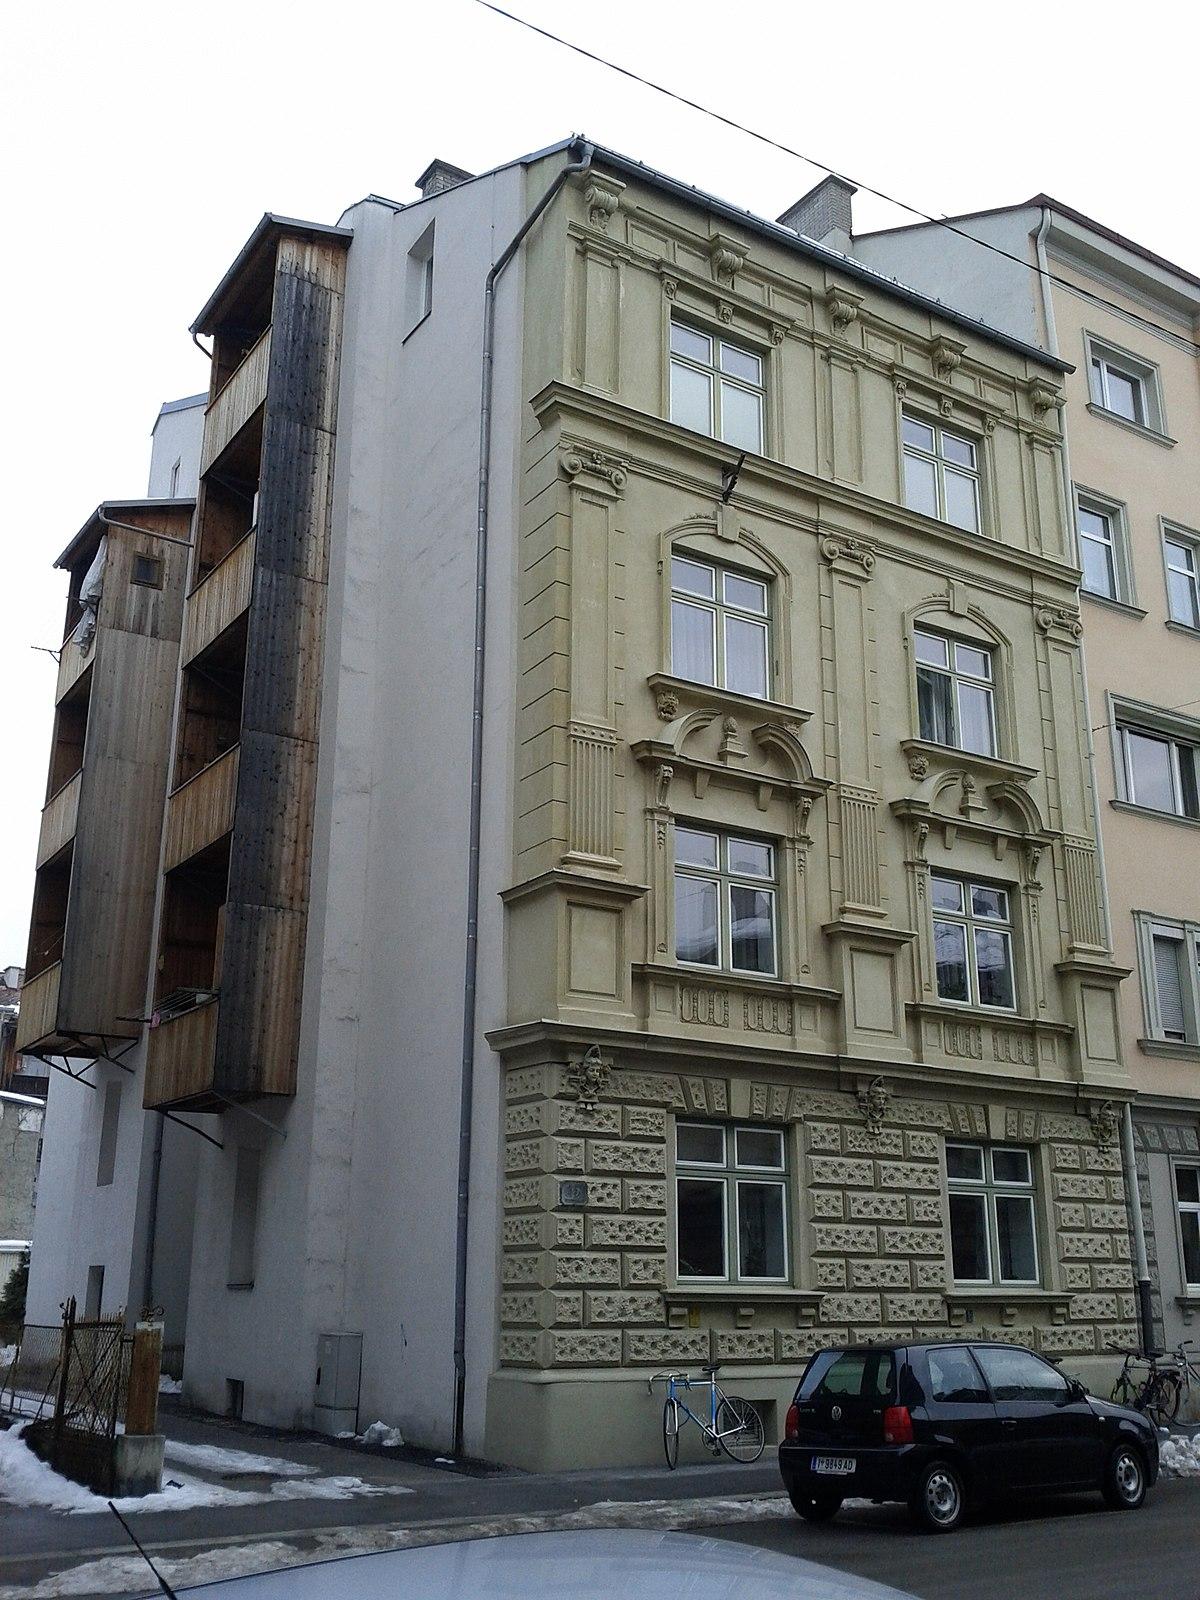 Architekturfhrer Innsbruck / Architectural guide Innsbruck